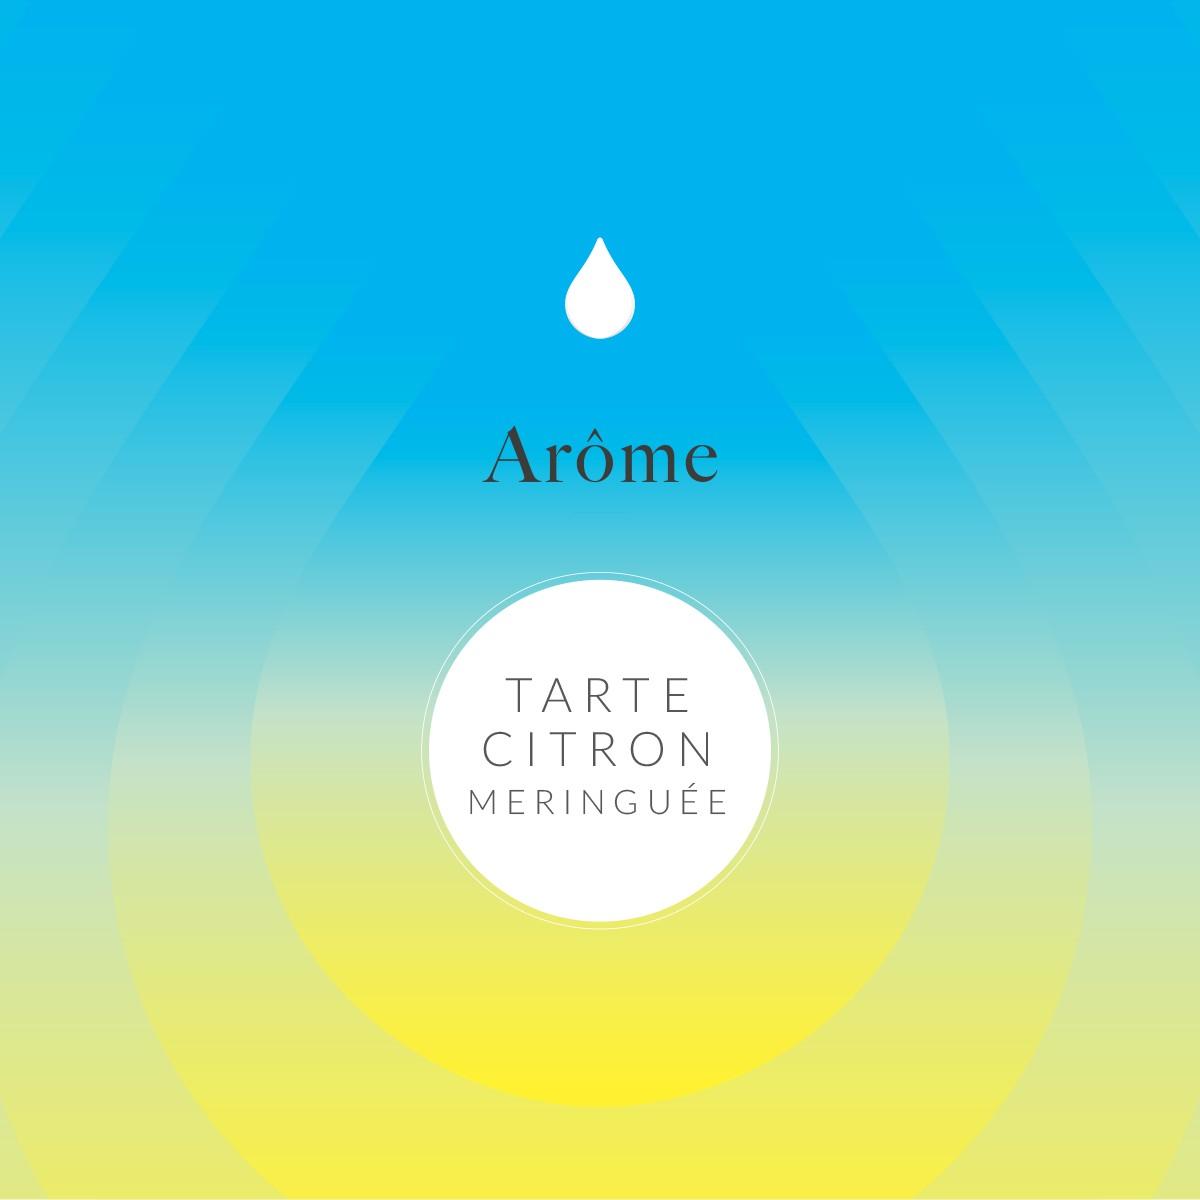 Arôme Tarte Citron Meringuée